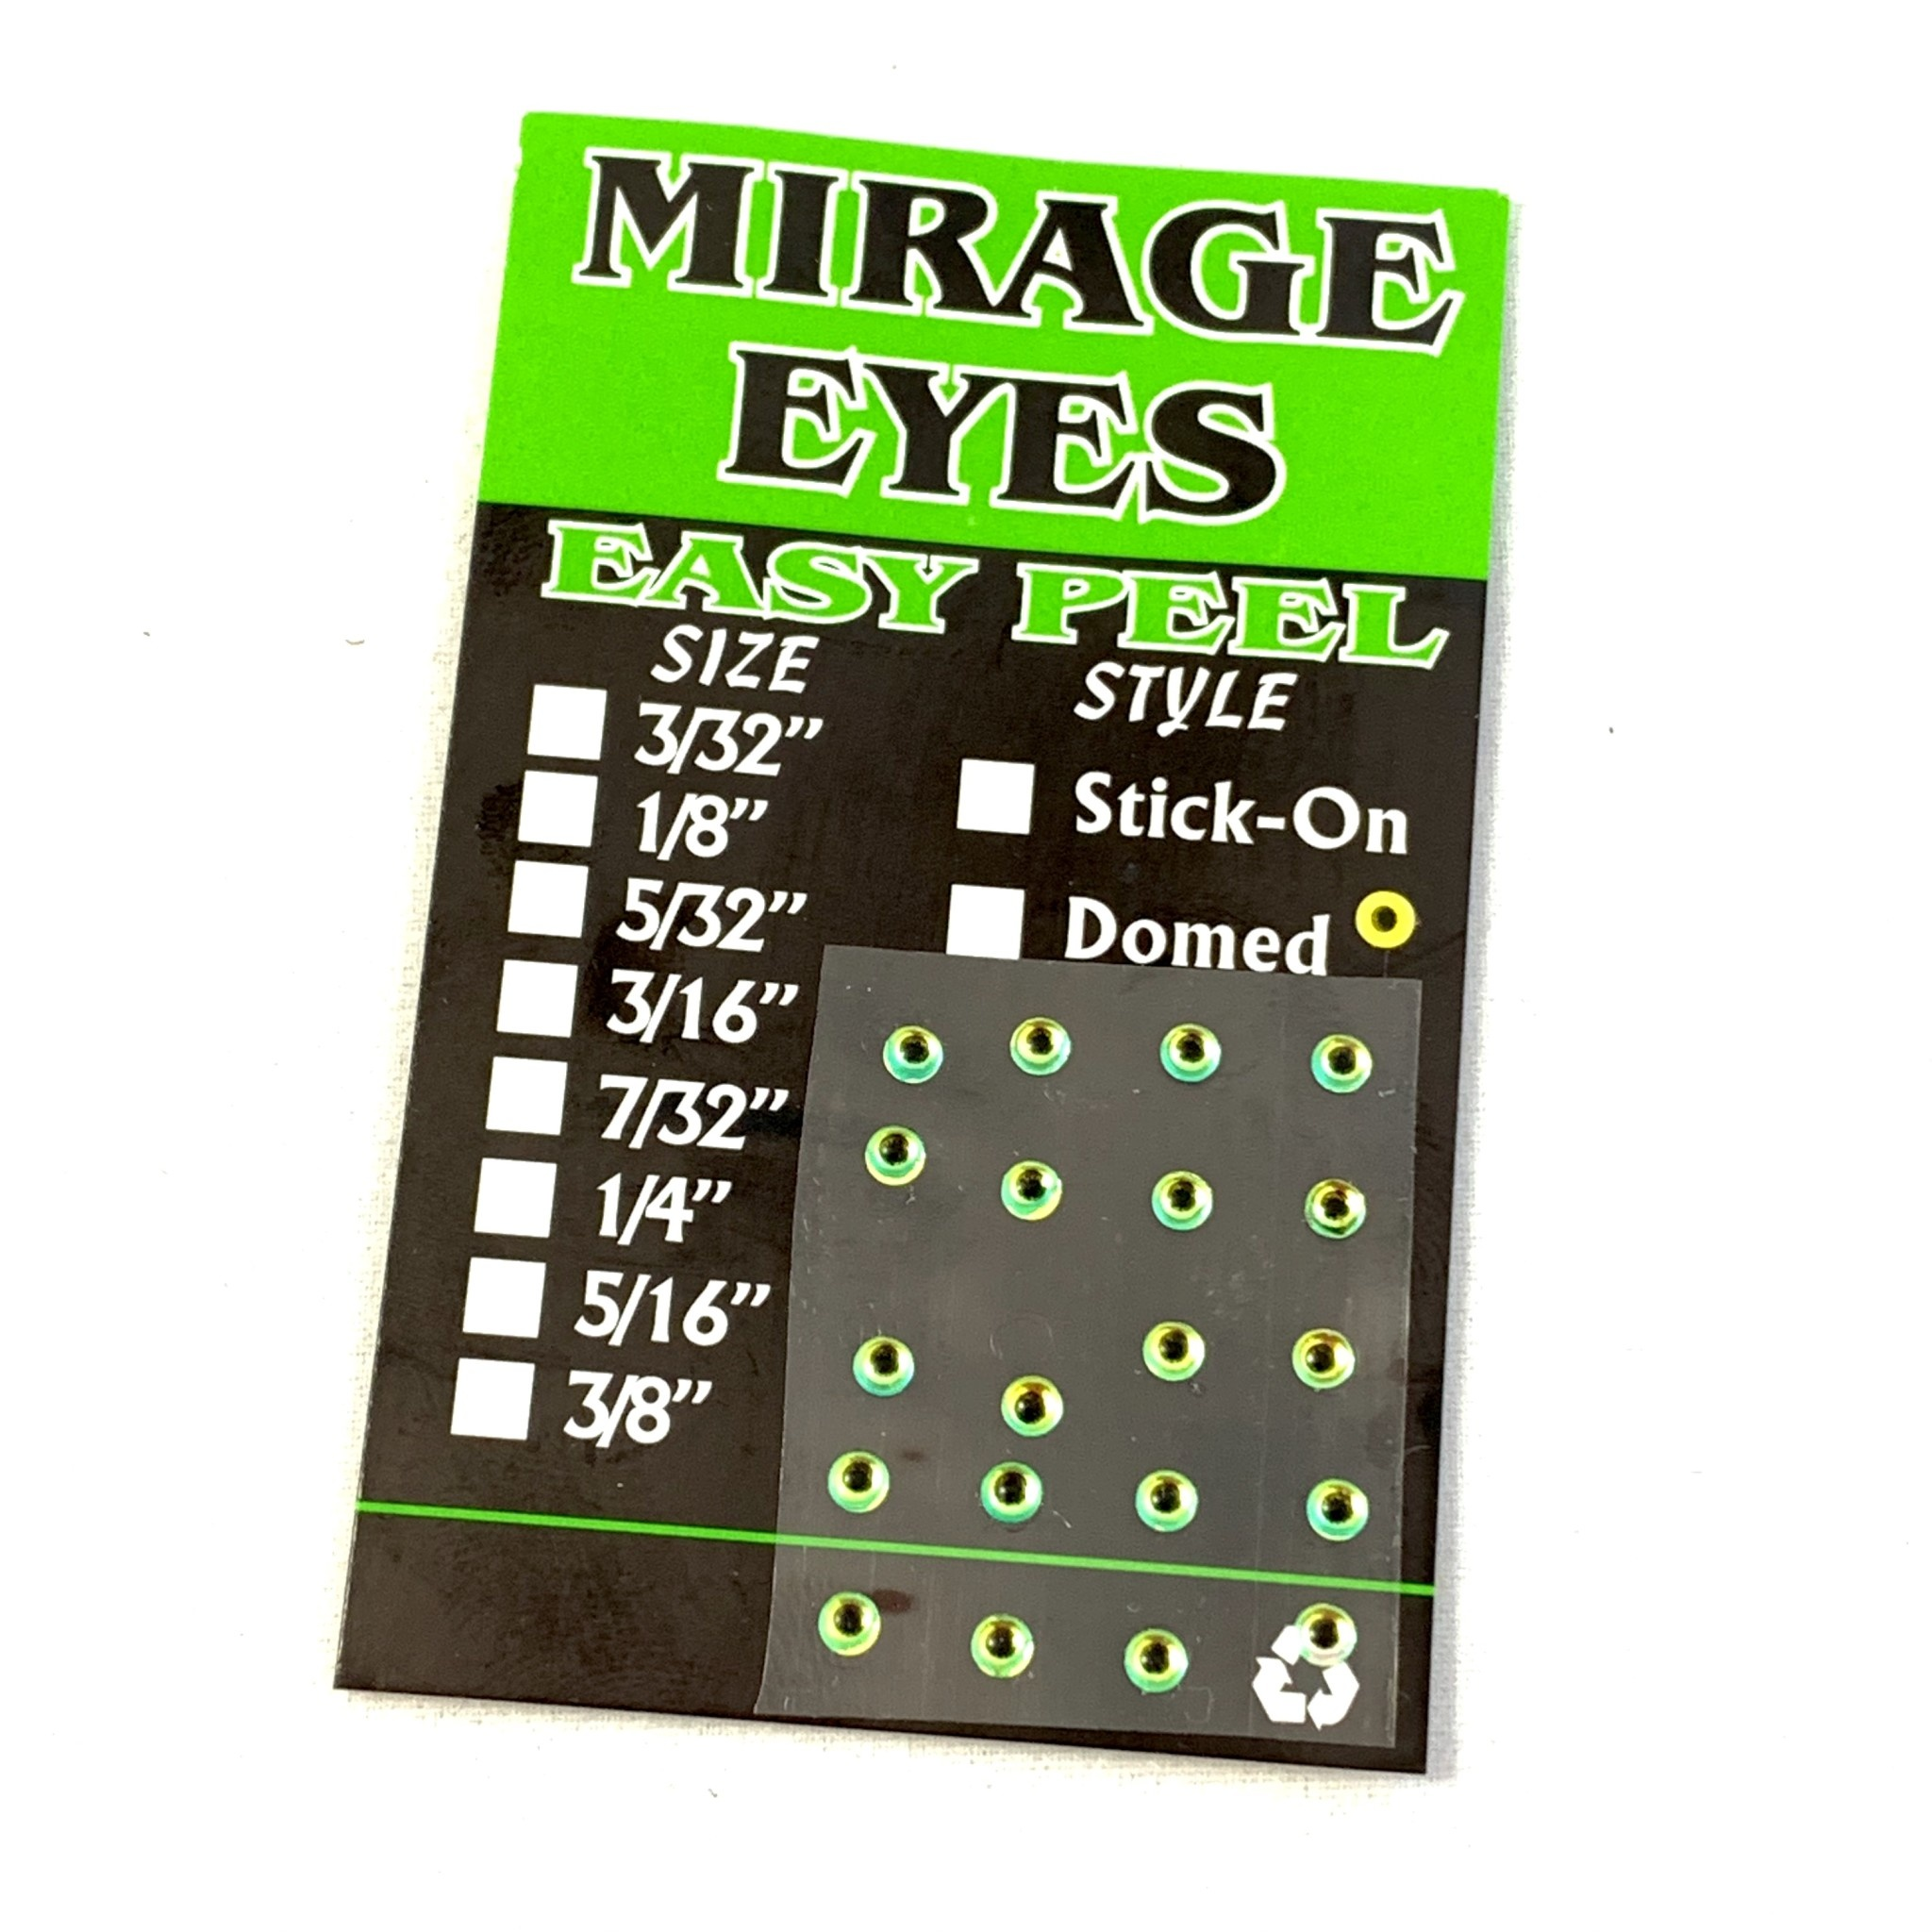 Hologram Dome Eyes, Mirage